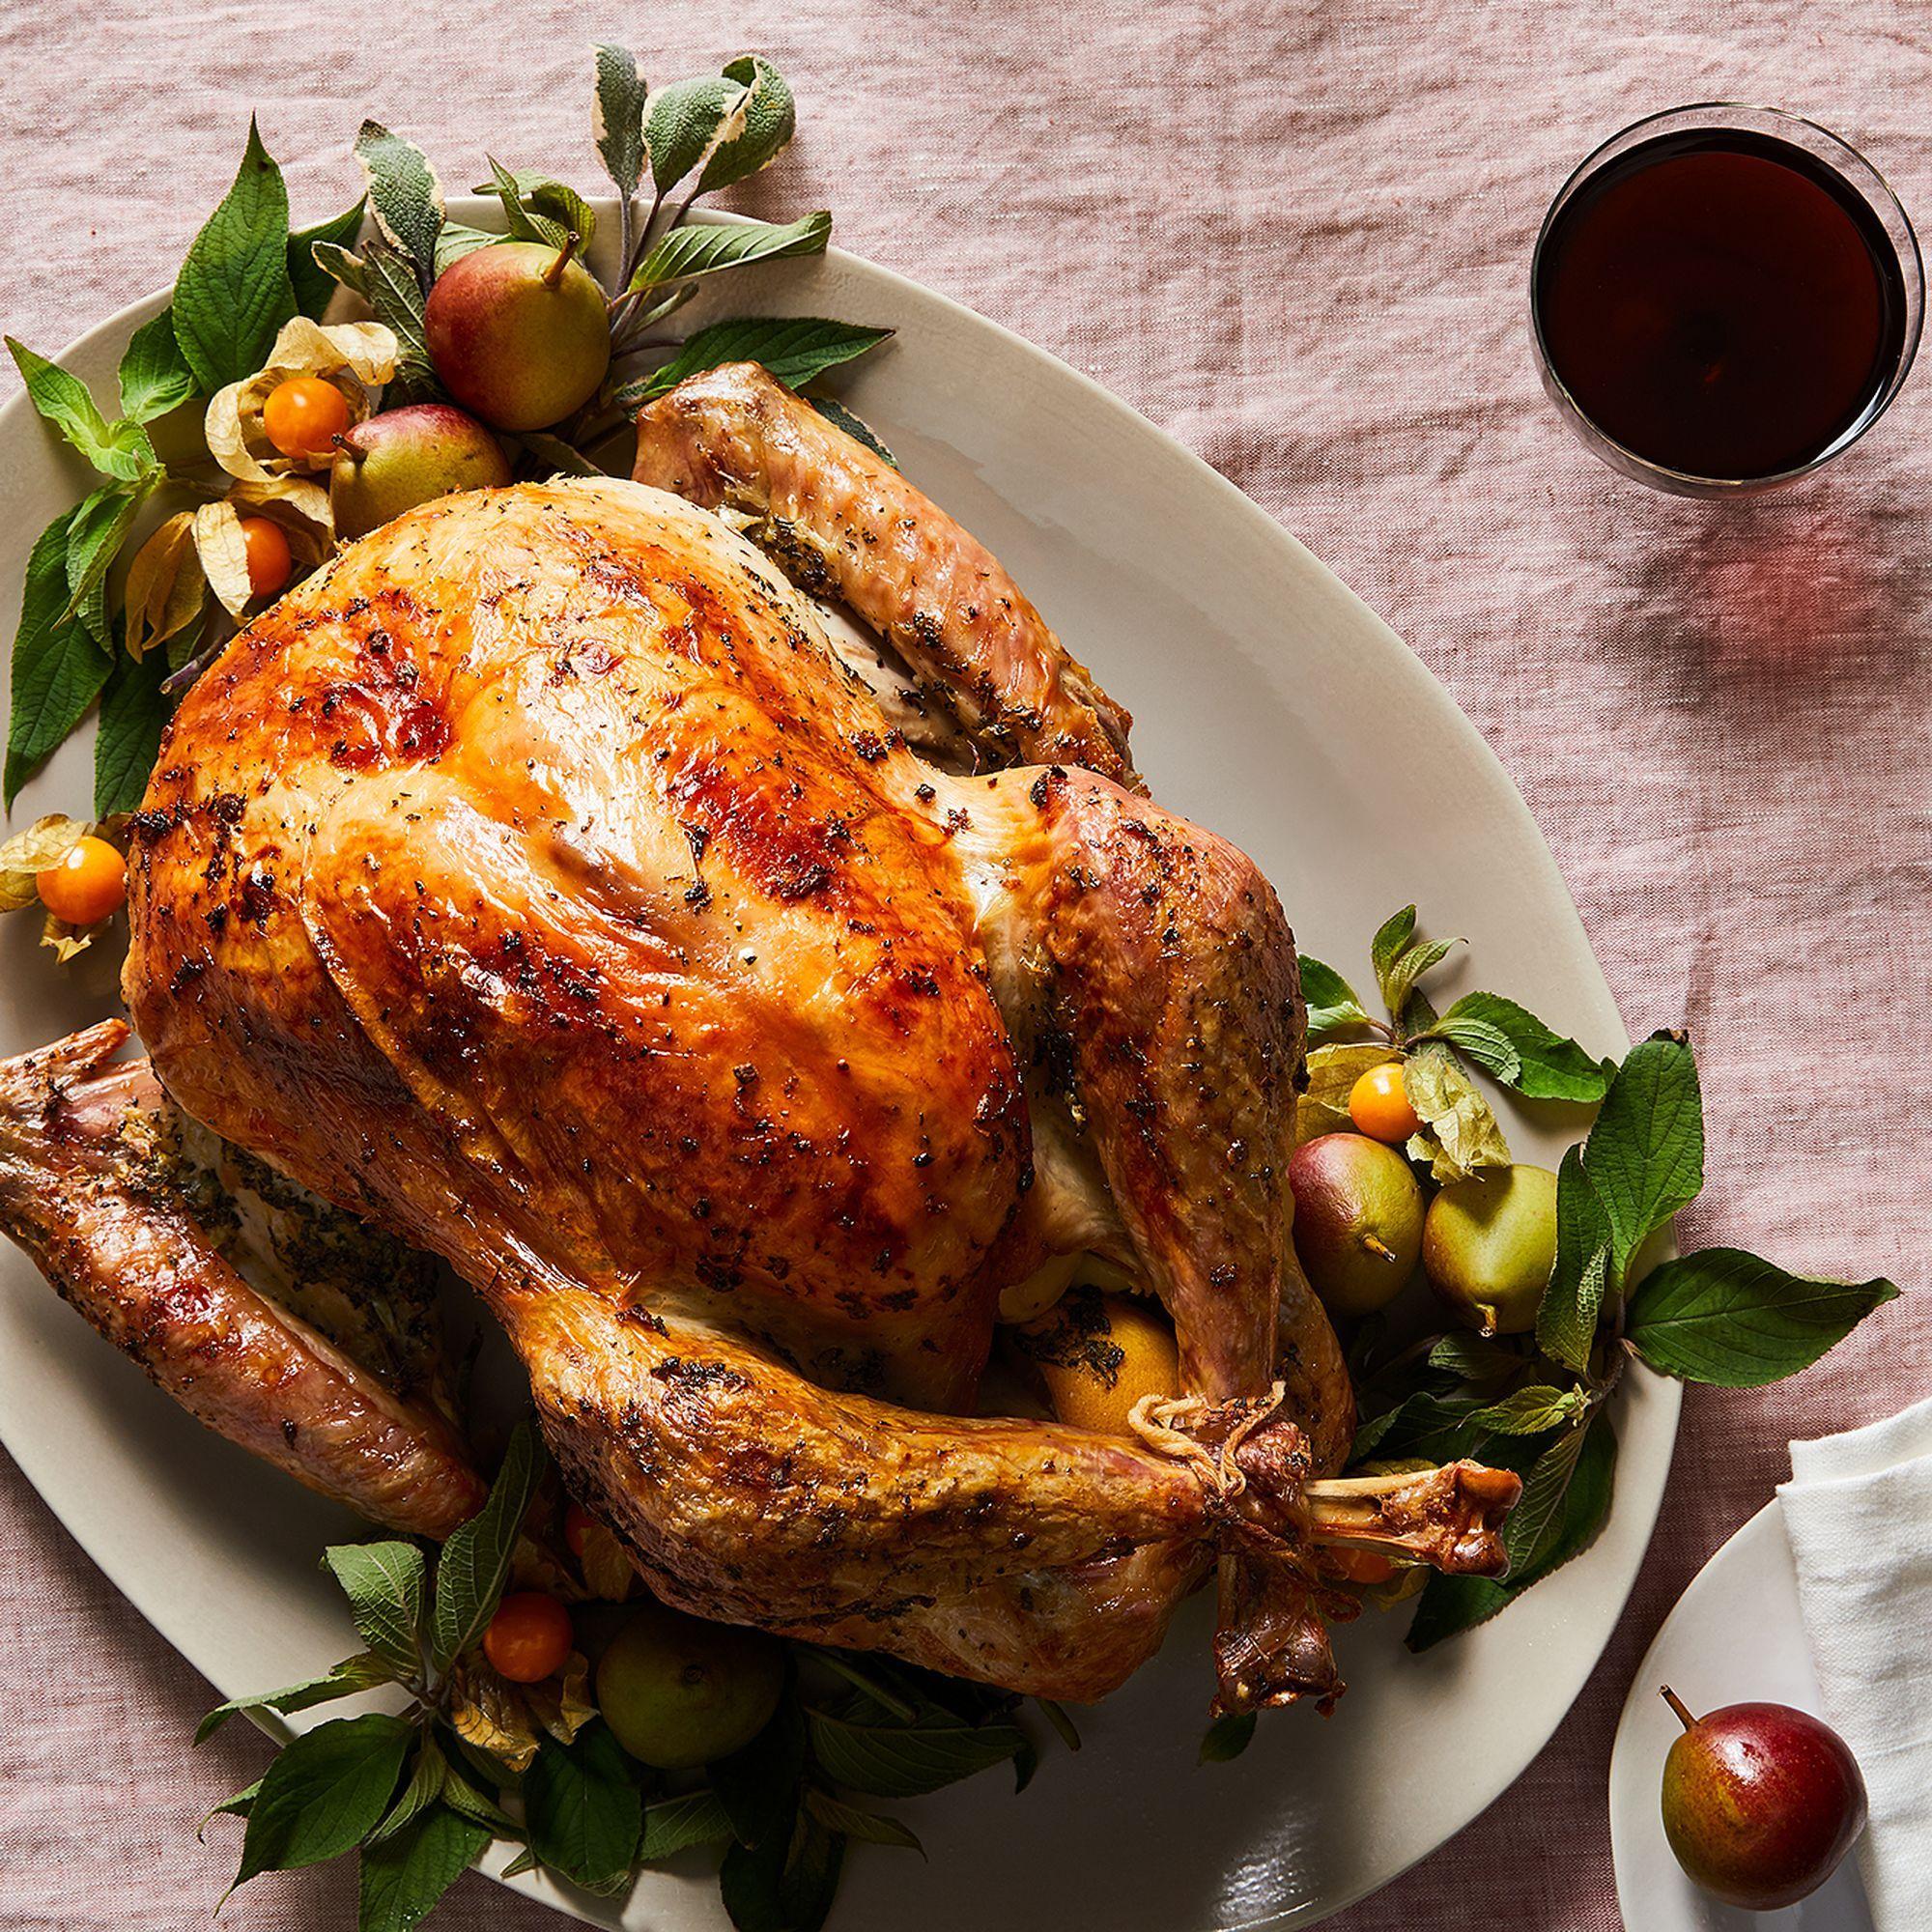 A Foolproof Method for Juicy (NotDry!) Roast Turkey